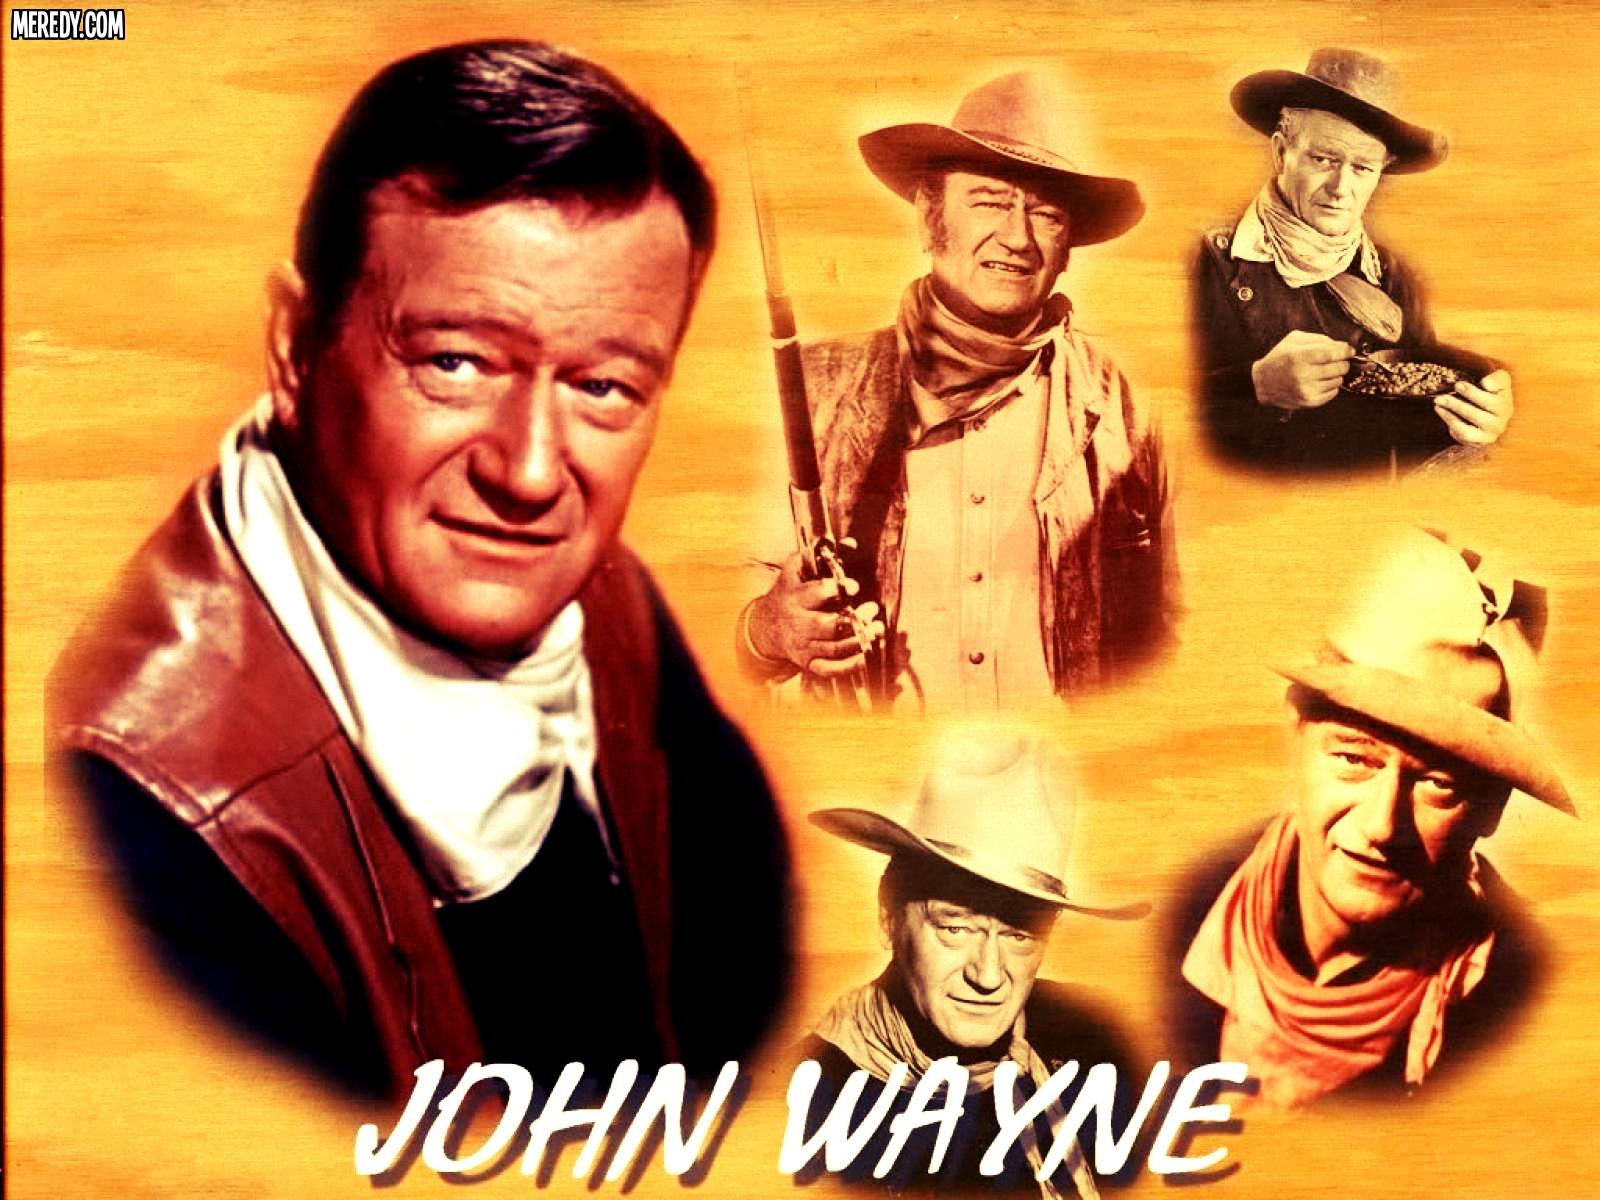 John Wayne Wallpaper 17   1600 X 1200 stmednet 1600x1200